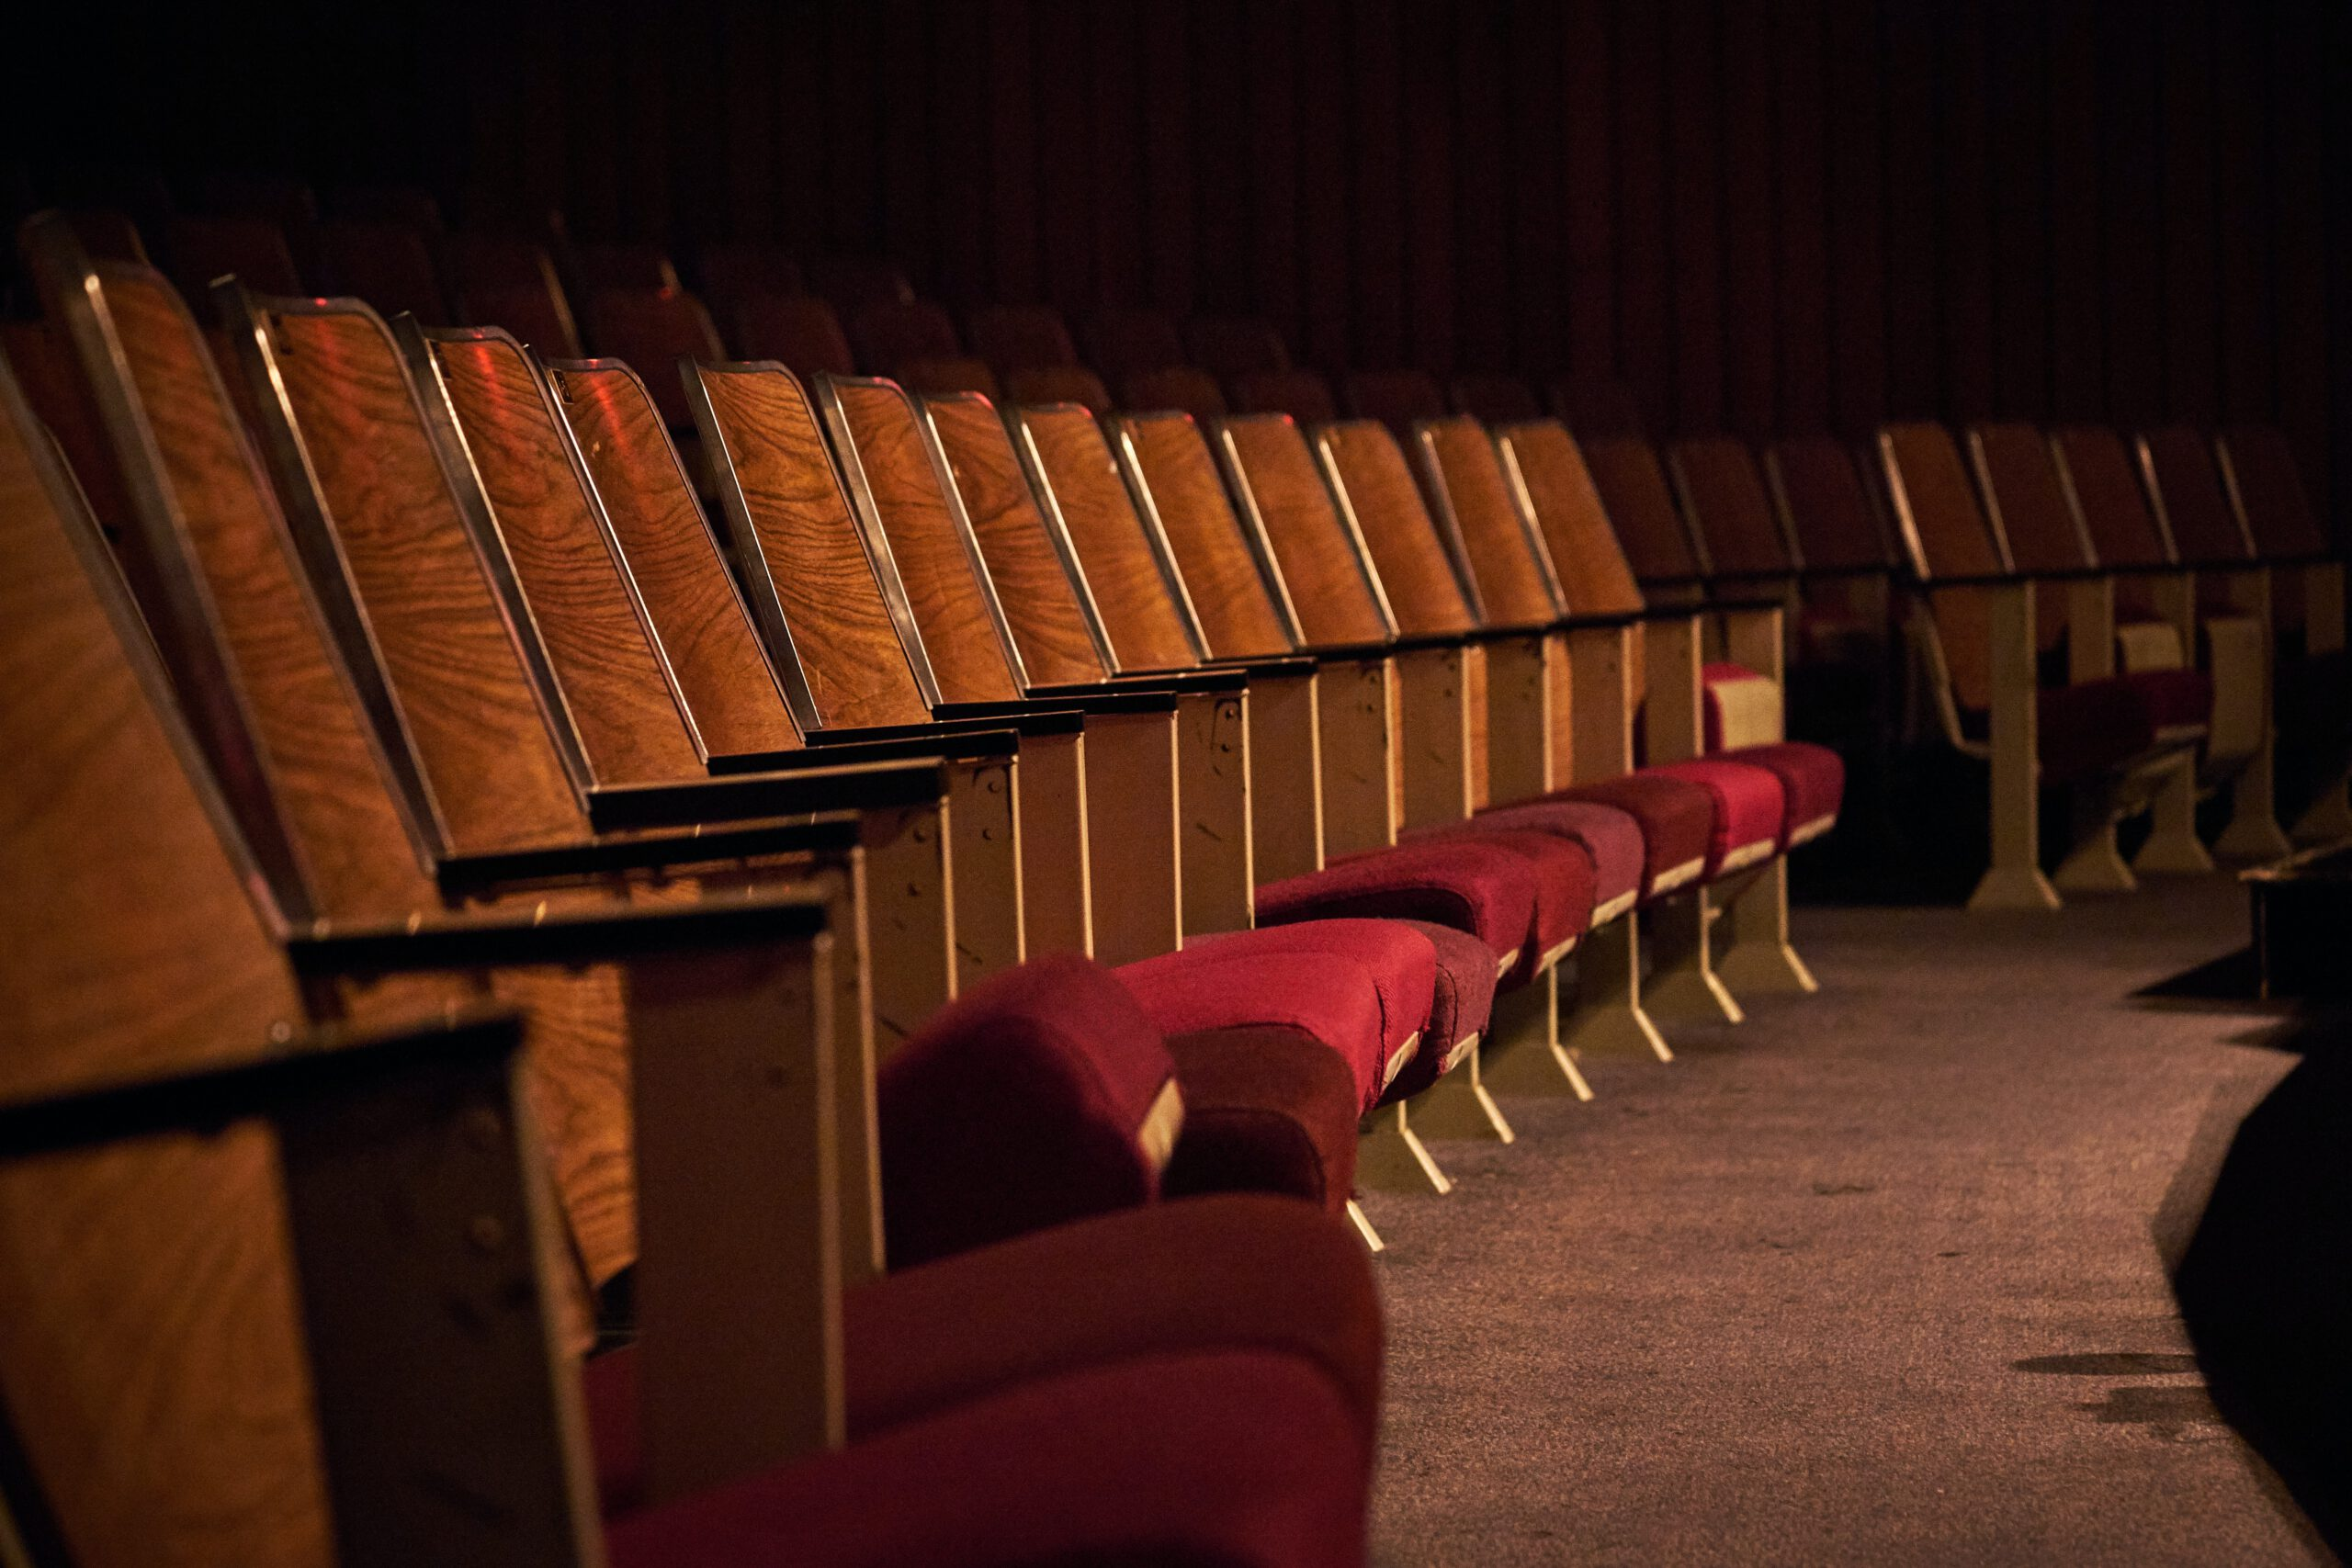 Teatterin istuimia